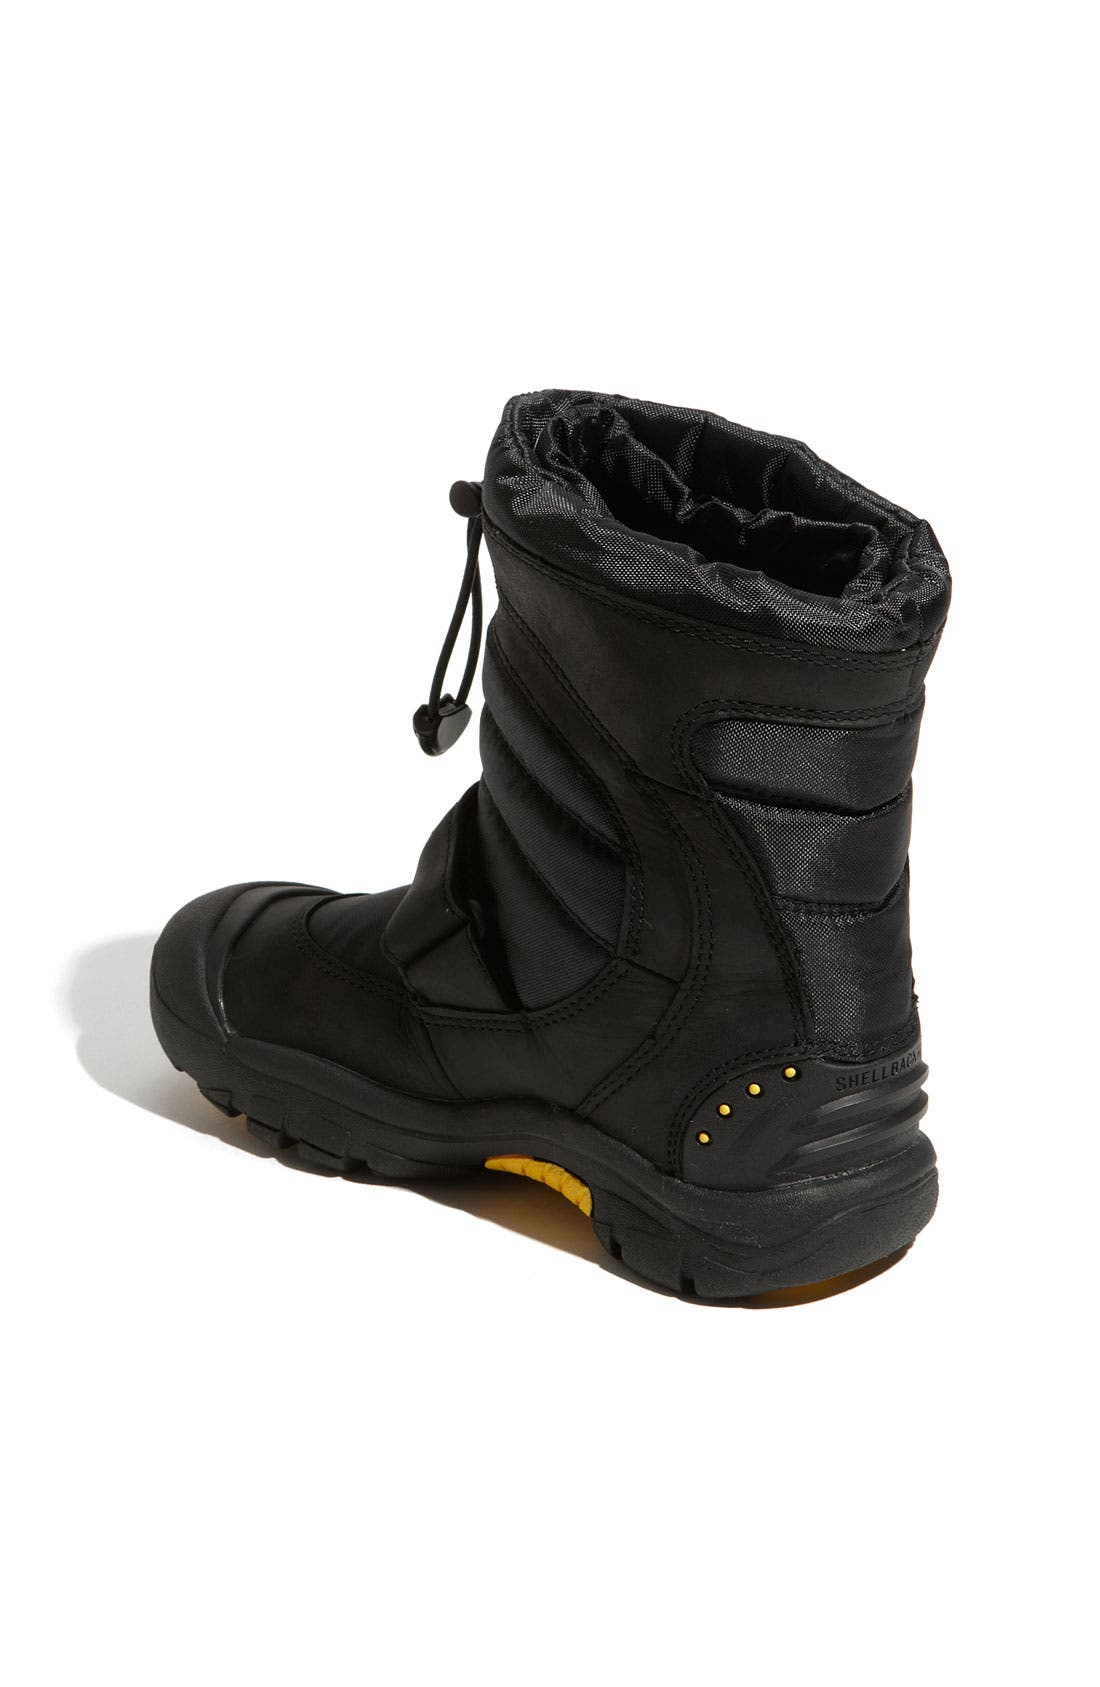 Alternate Image 2  - Keen 'Breckenridge' Waterproof Boot (Toddler, Little Kid & Big Kid)